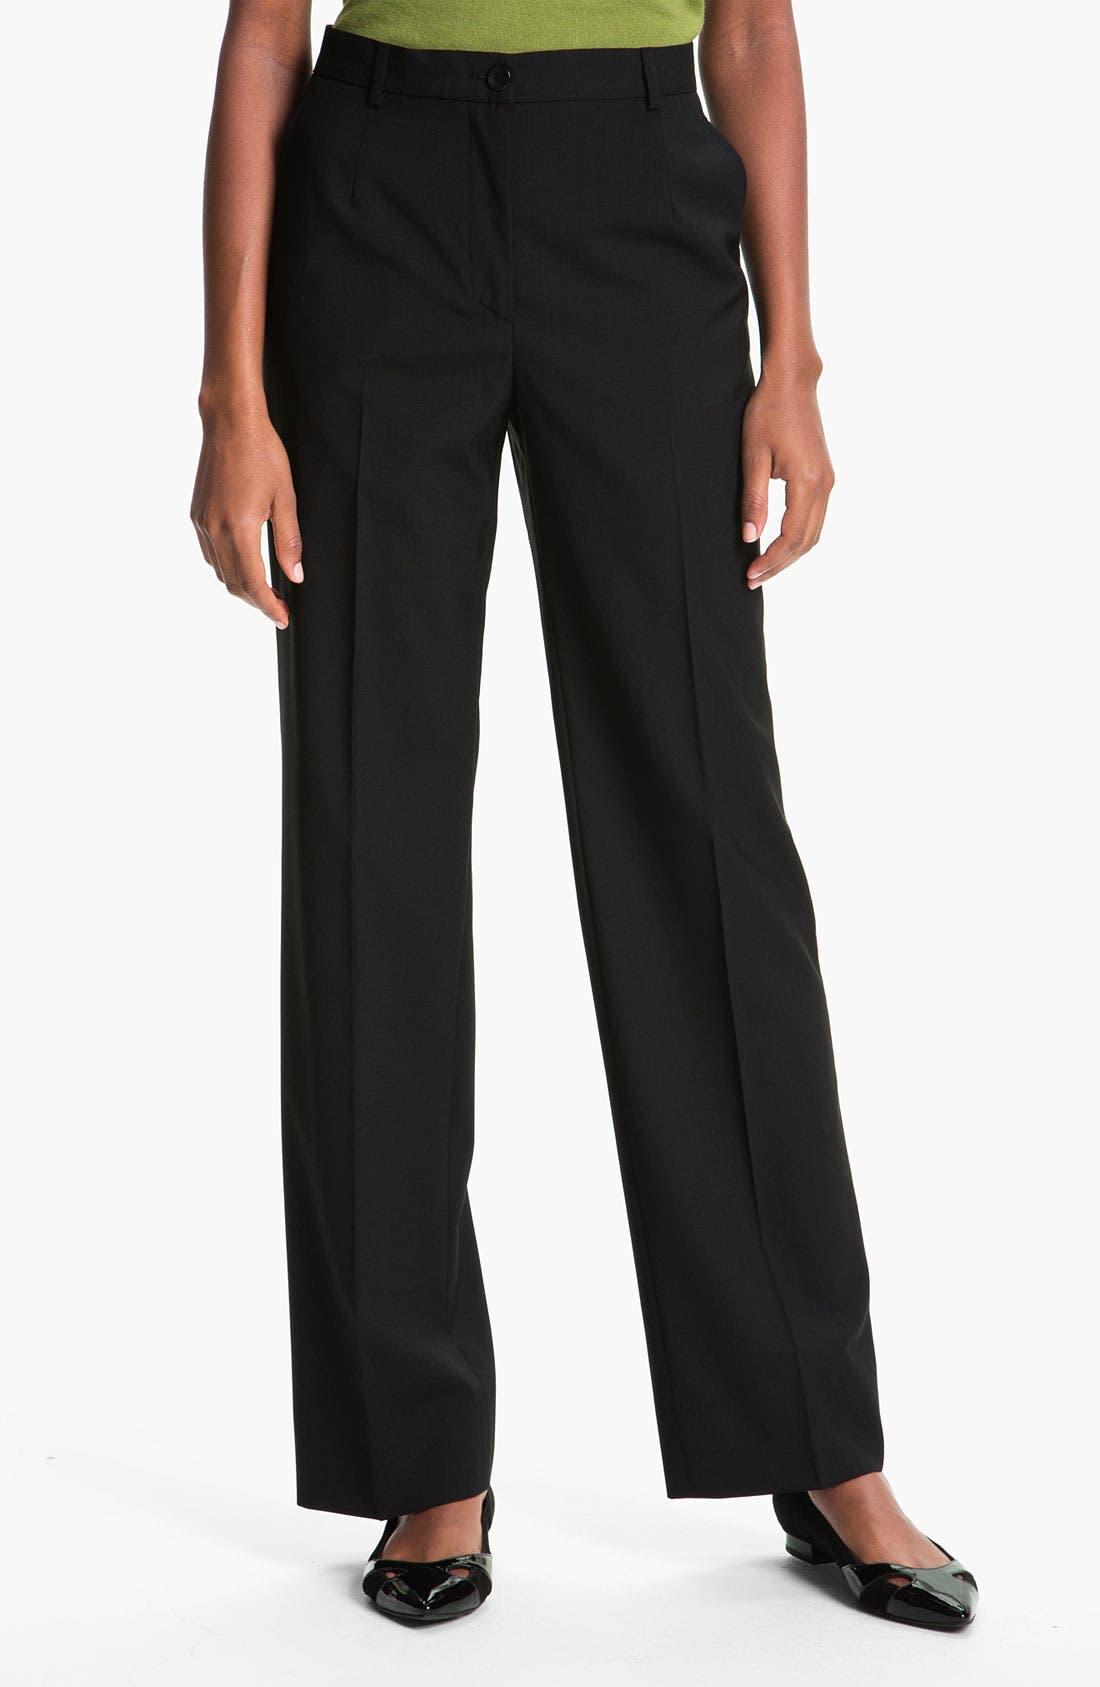 Alternate Image 1 Selected - Zanella 'Goldie' Stretch Wool Pants